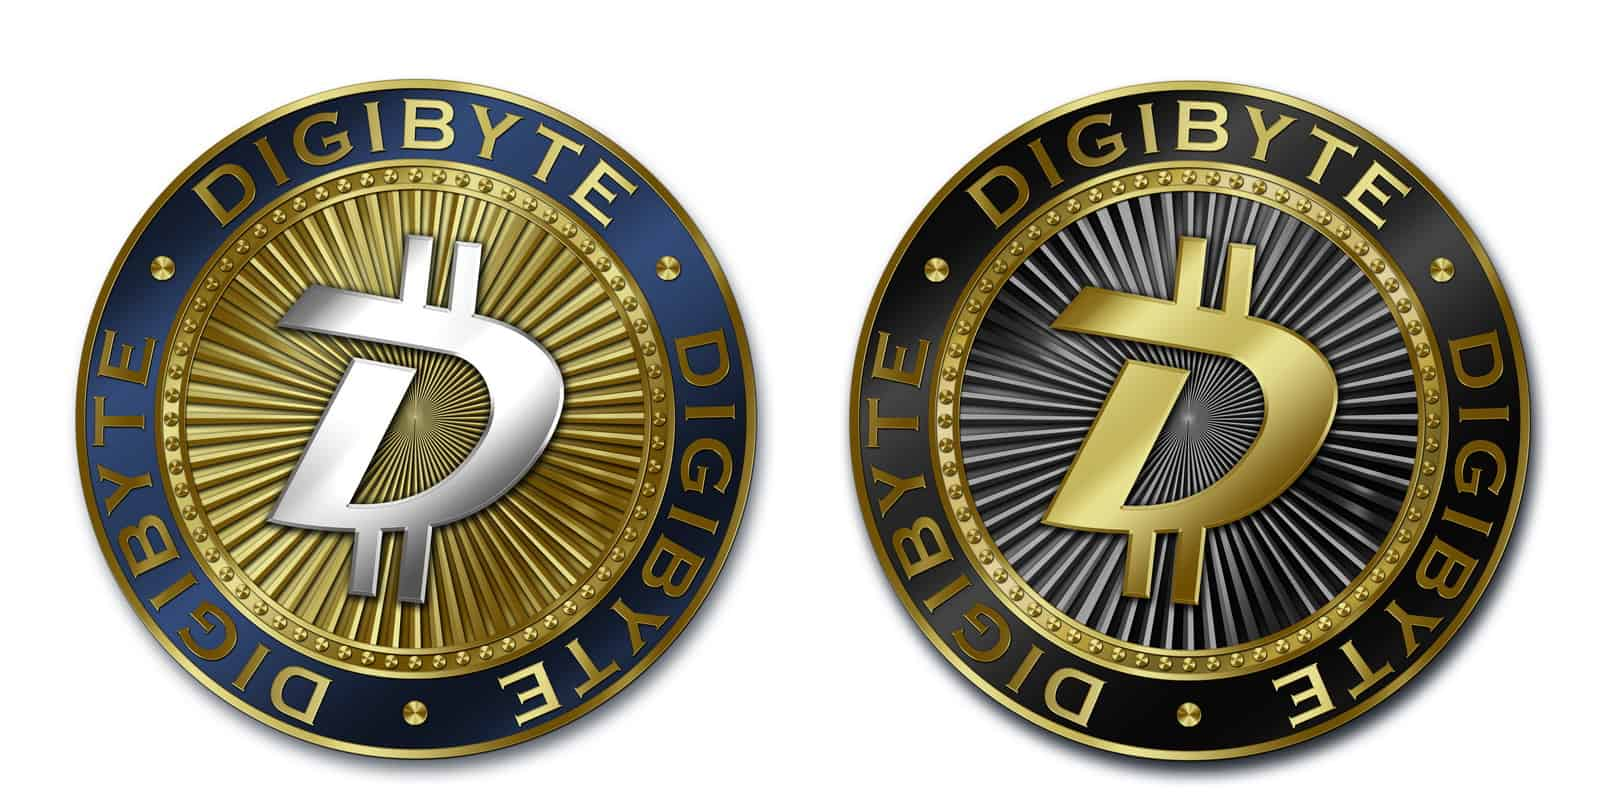 euGenius Vision accepts Digibyte DGB